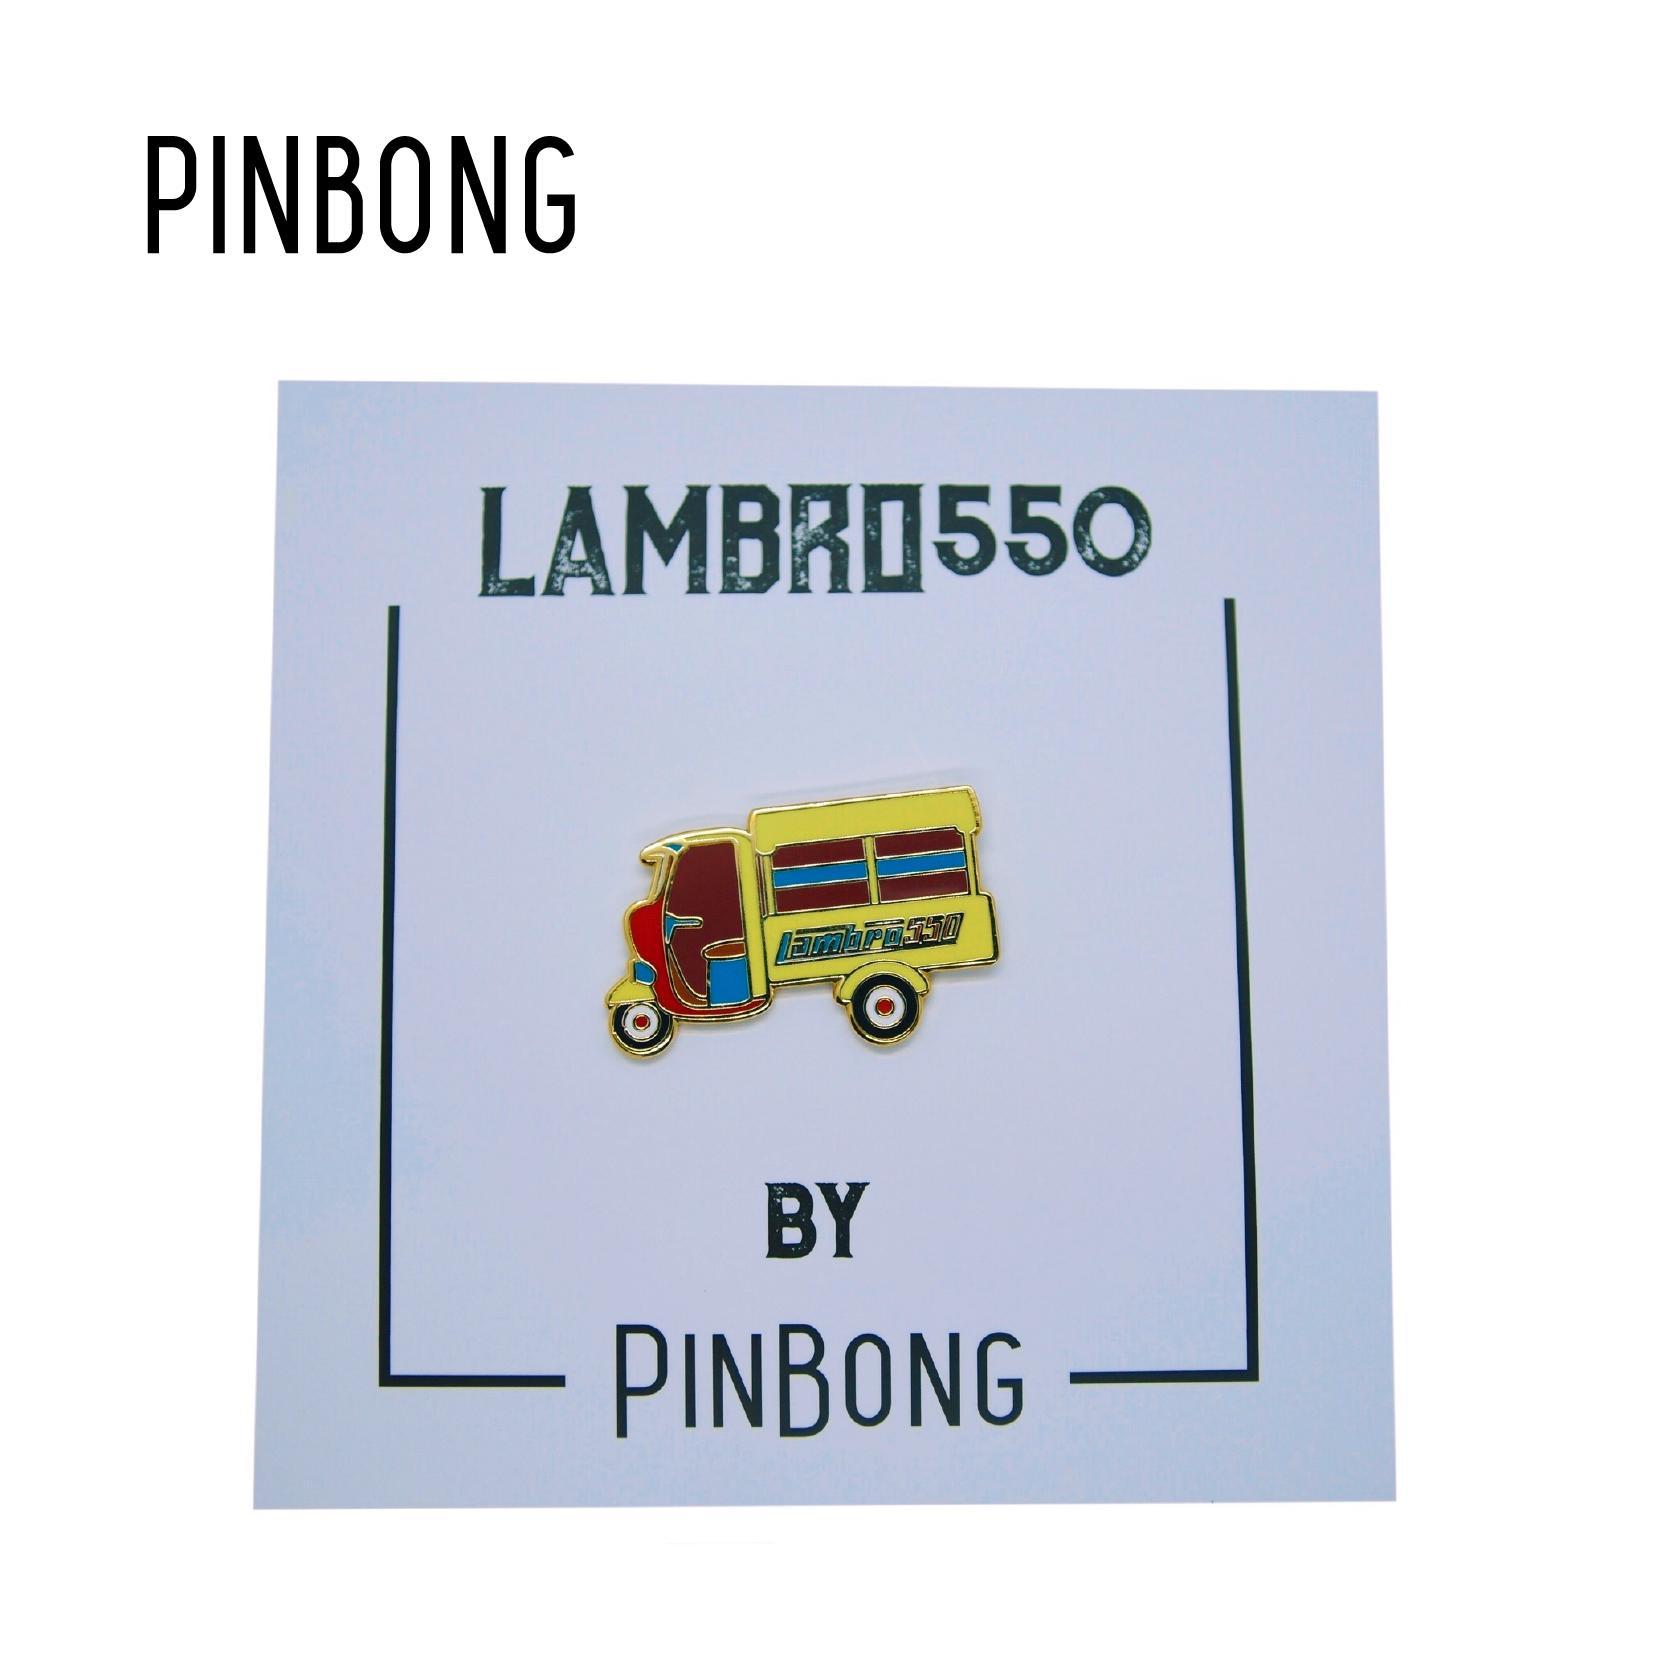 Huy Hiệu Xe Lambro550 PINBONG